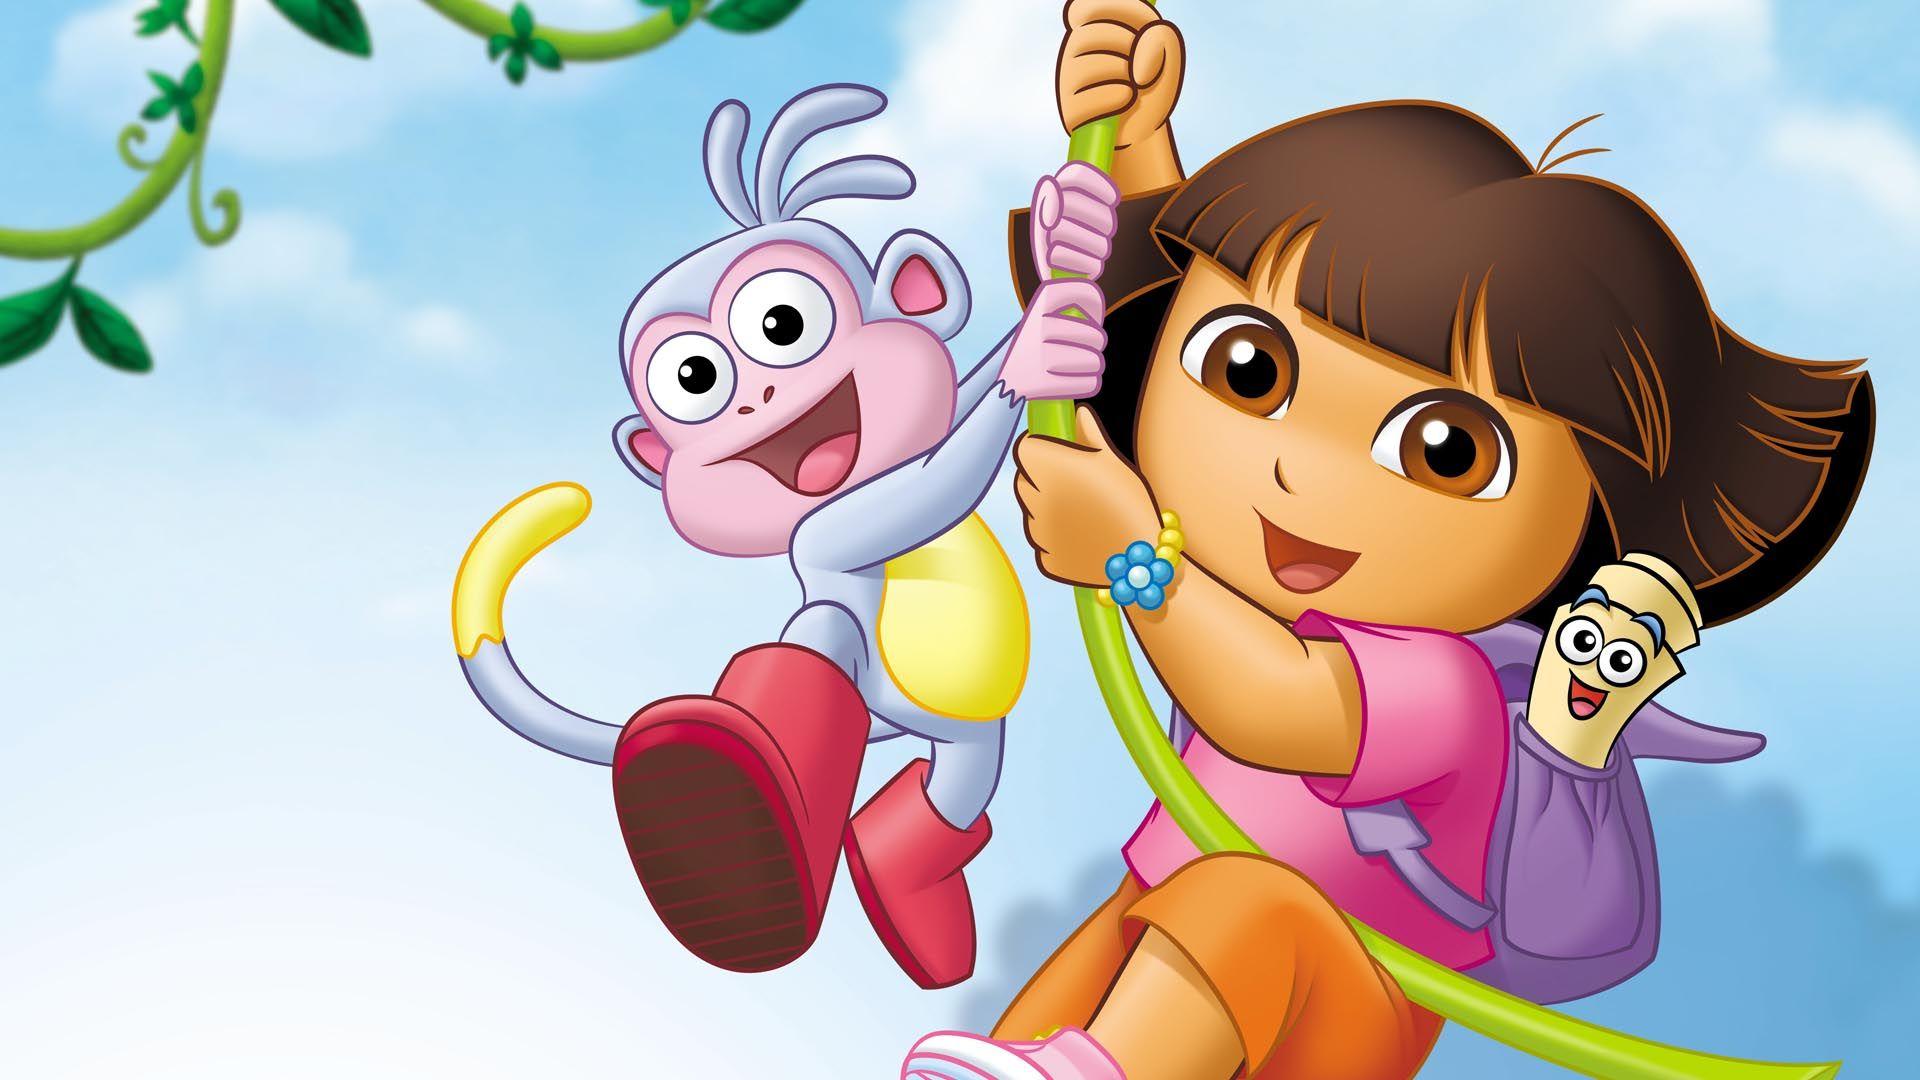 Dora 1080p wallpaper